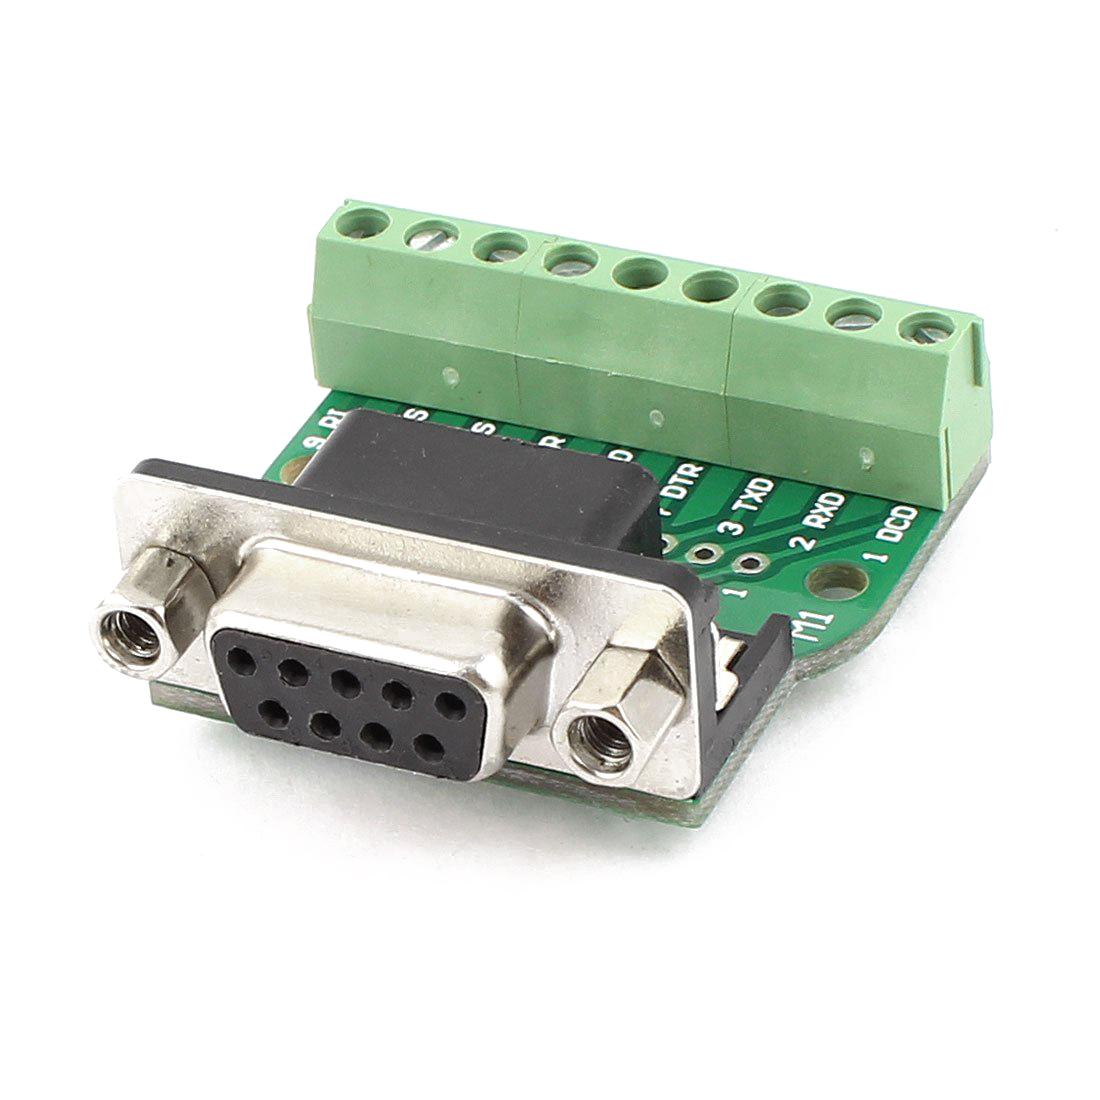 DB9 breakout connectors eBay